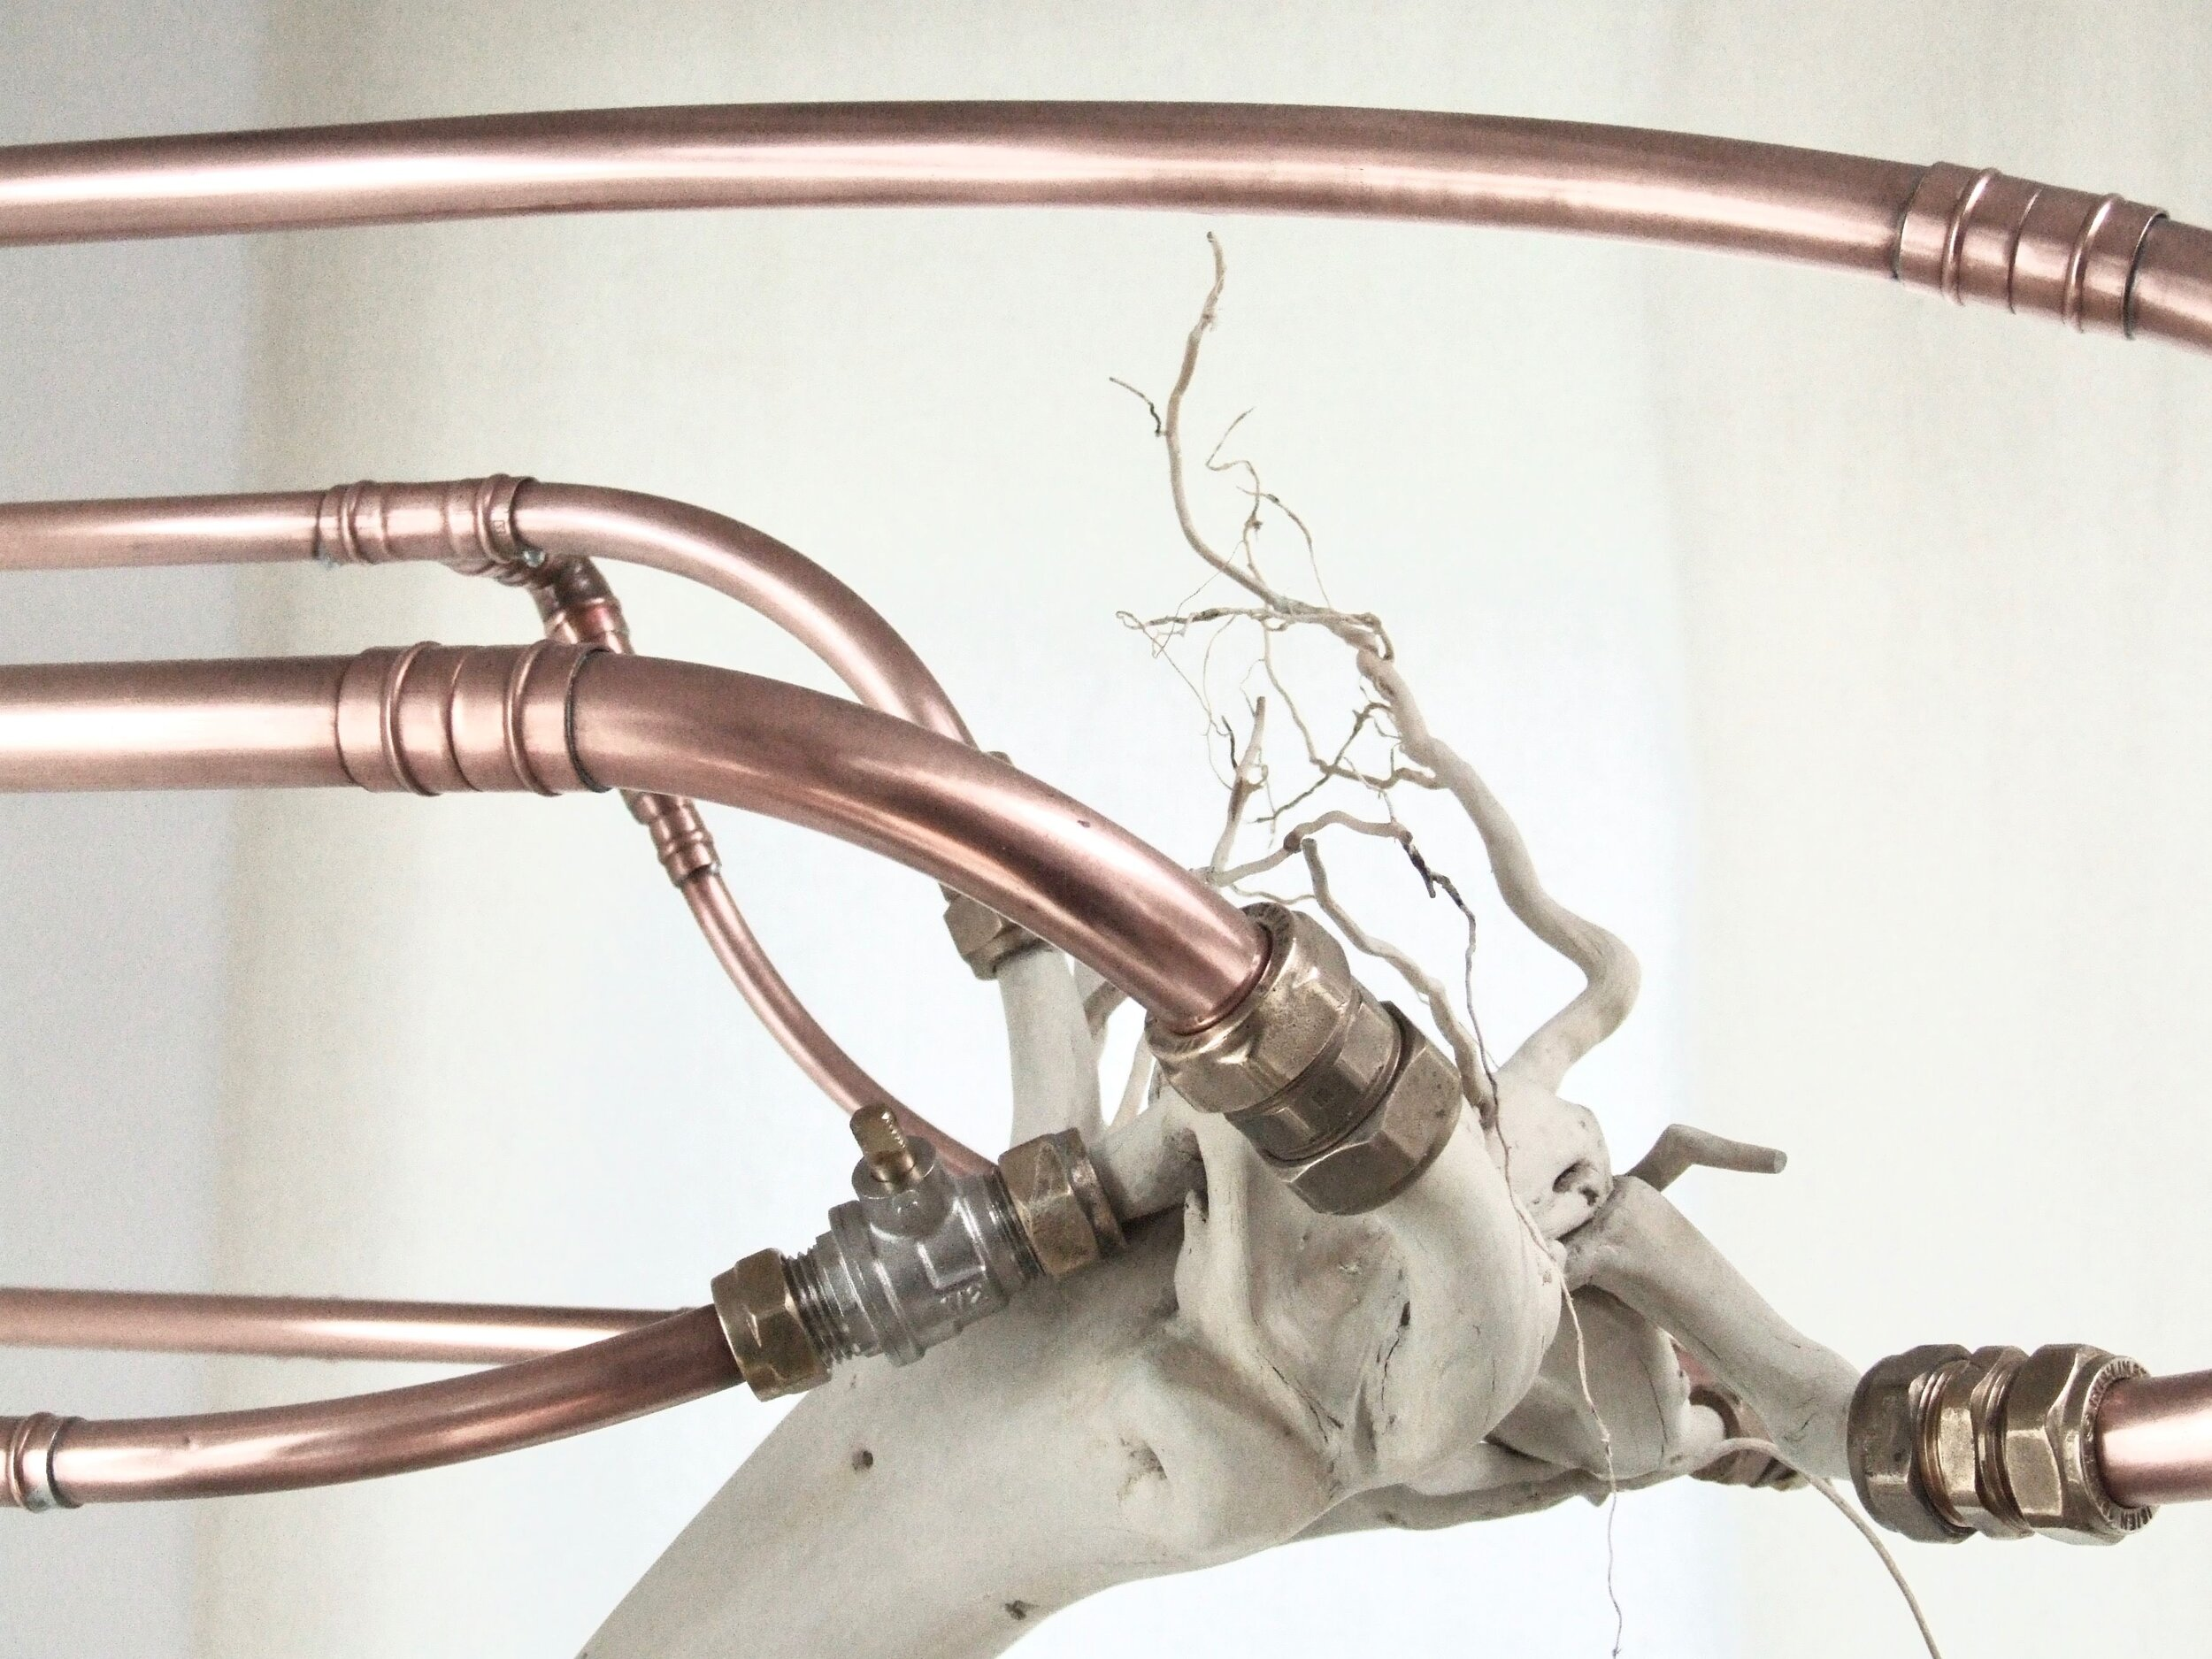 Post , Katherine Sankey, Detail Photograph of 225 x 75 x 127cm Sculpture; copper, wood, rubber steel